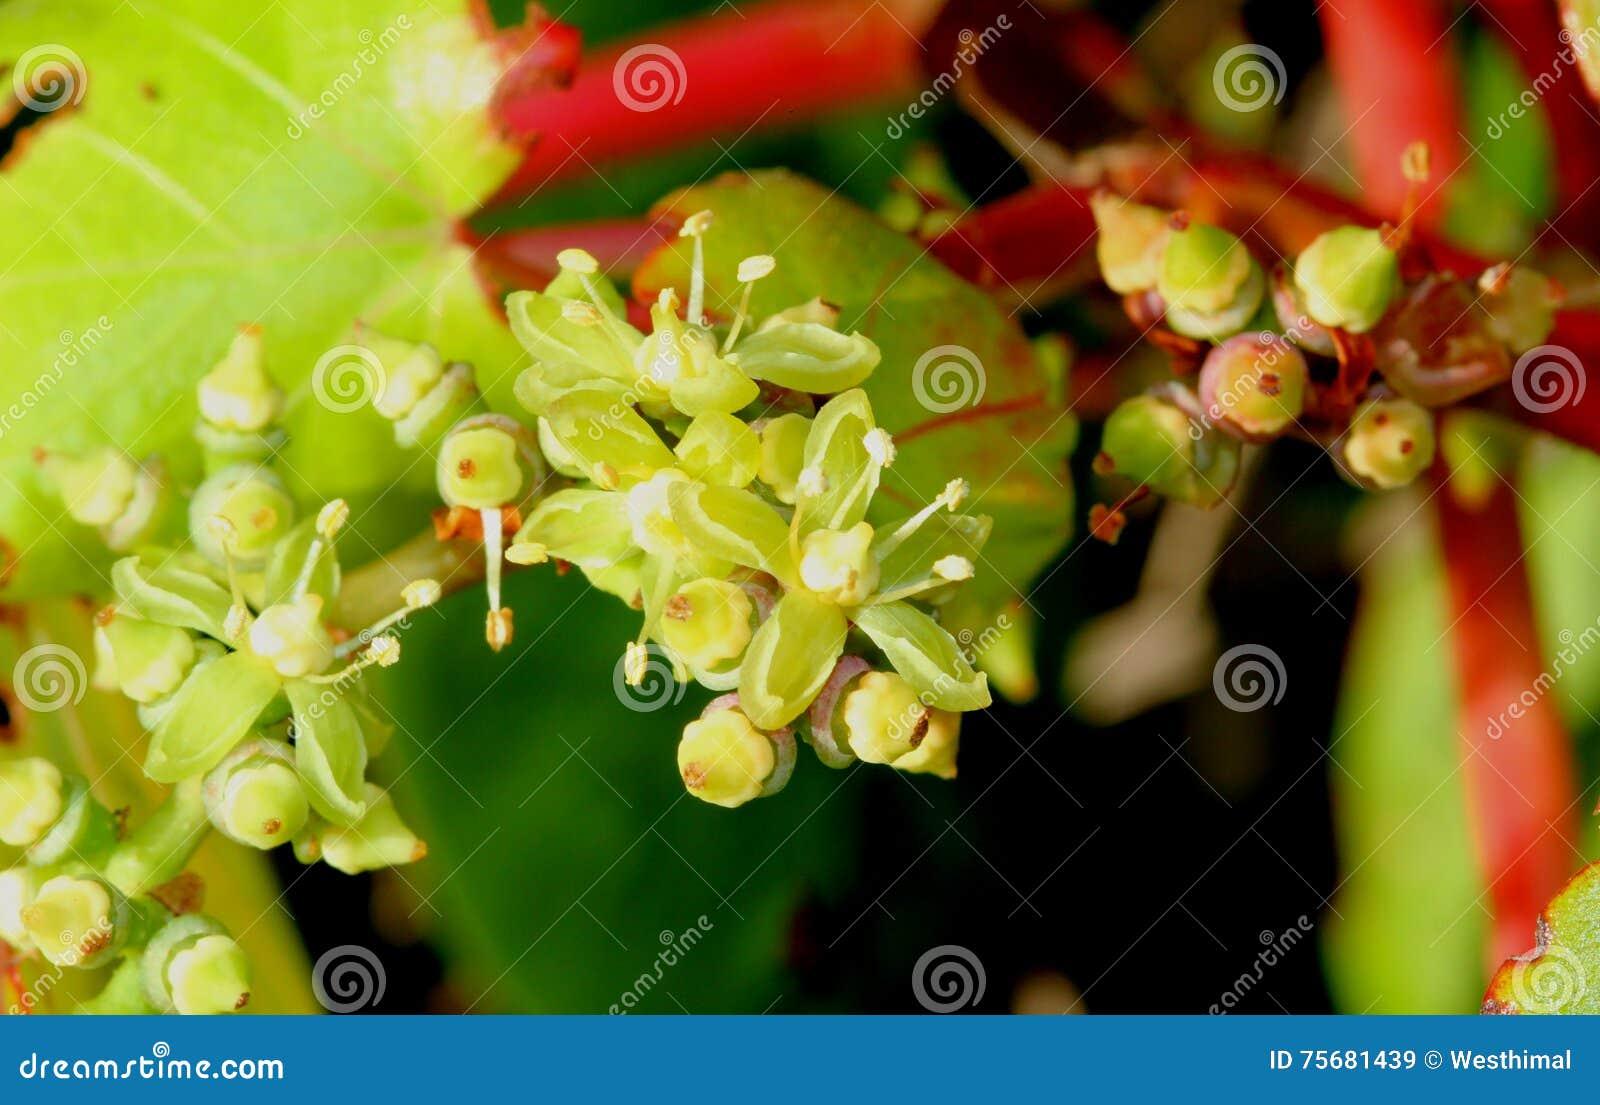 Flowers Of Parthenocissus Tricuspidata Japanese Creeper Grape Ivy